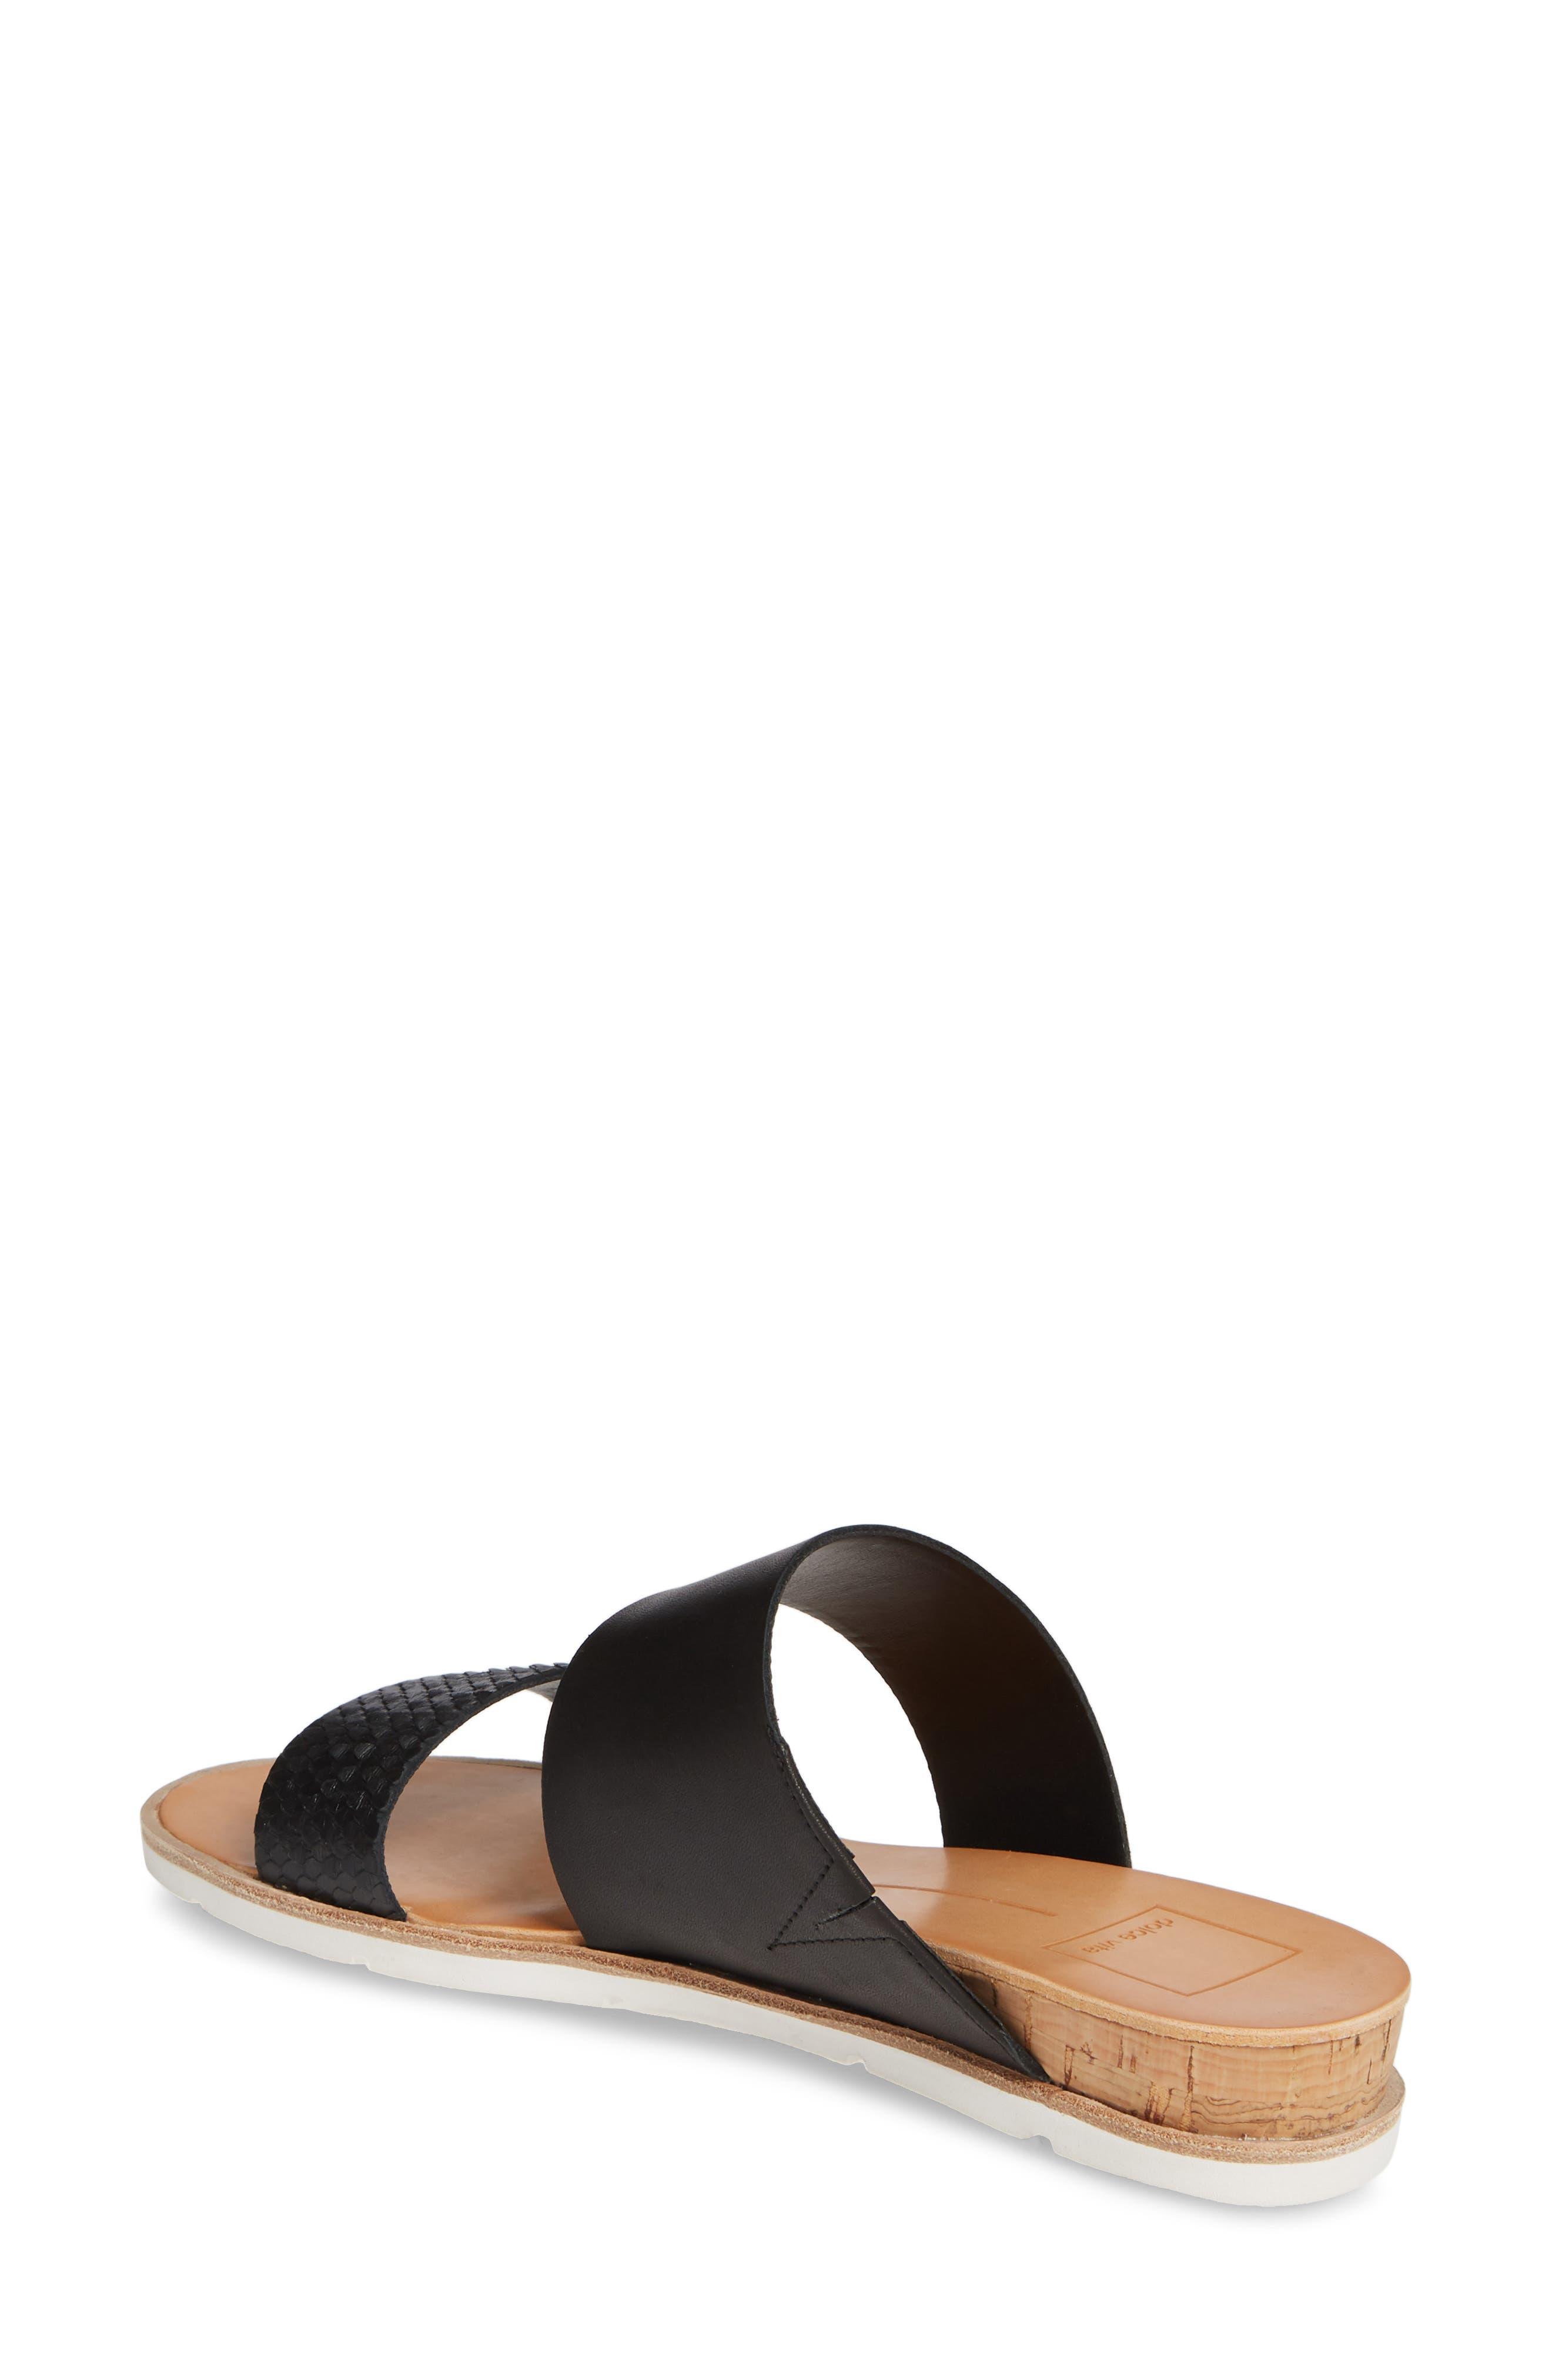 DOLCE VITA, Vala Wedge Slide Sandal, Alternate thumbnail 2, color, BLACK LEATHER